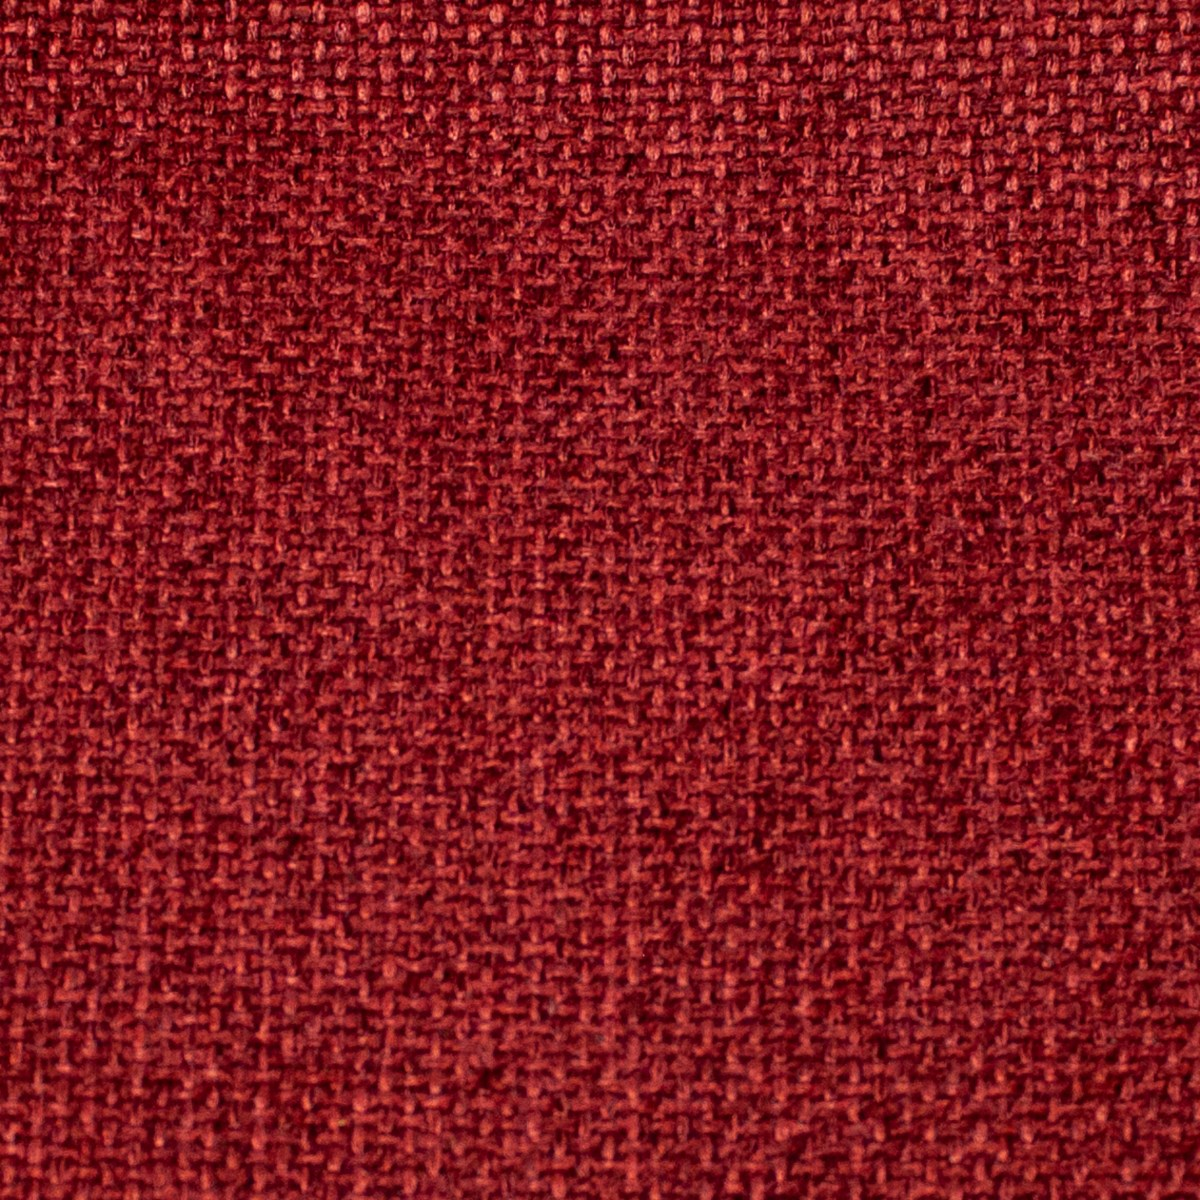 Verona Sofa 245 - Rate